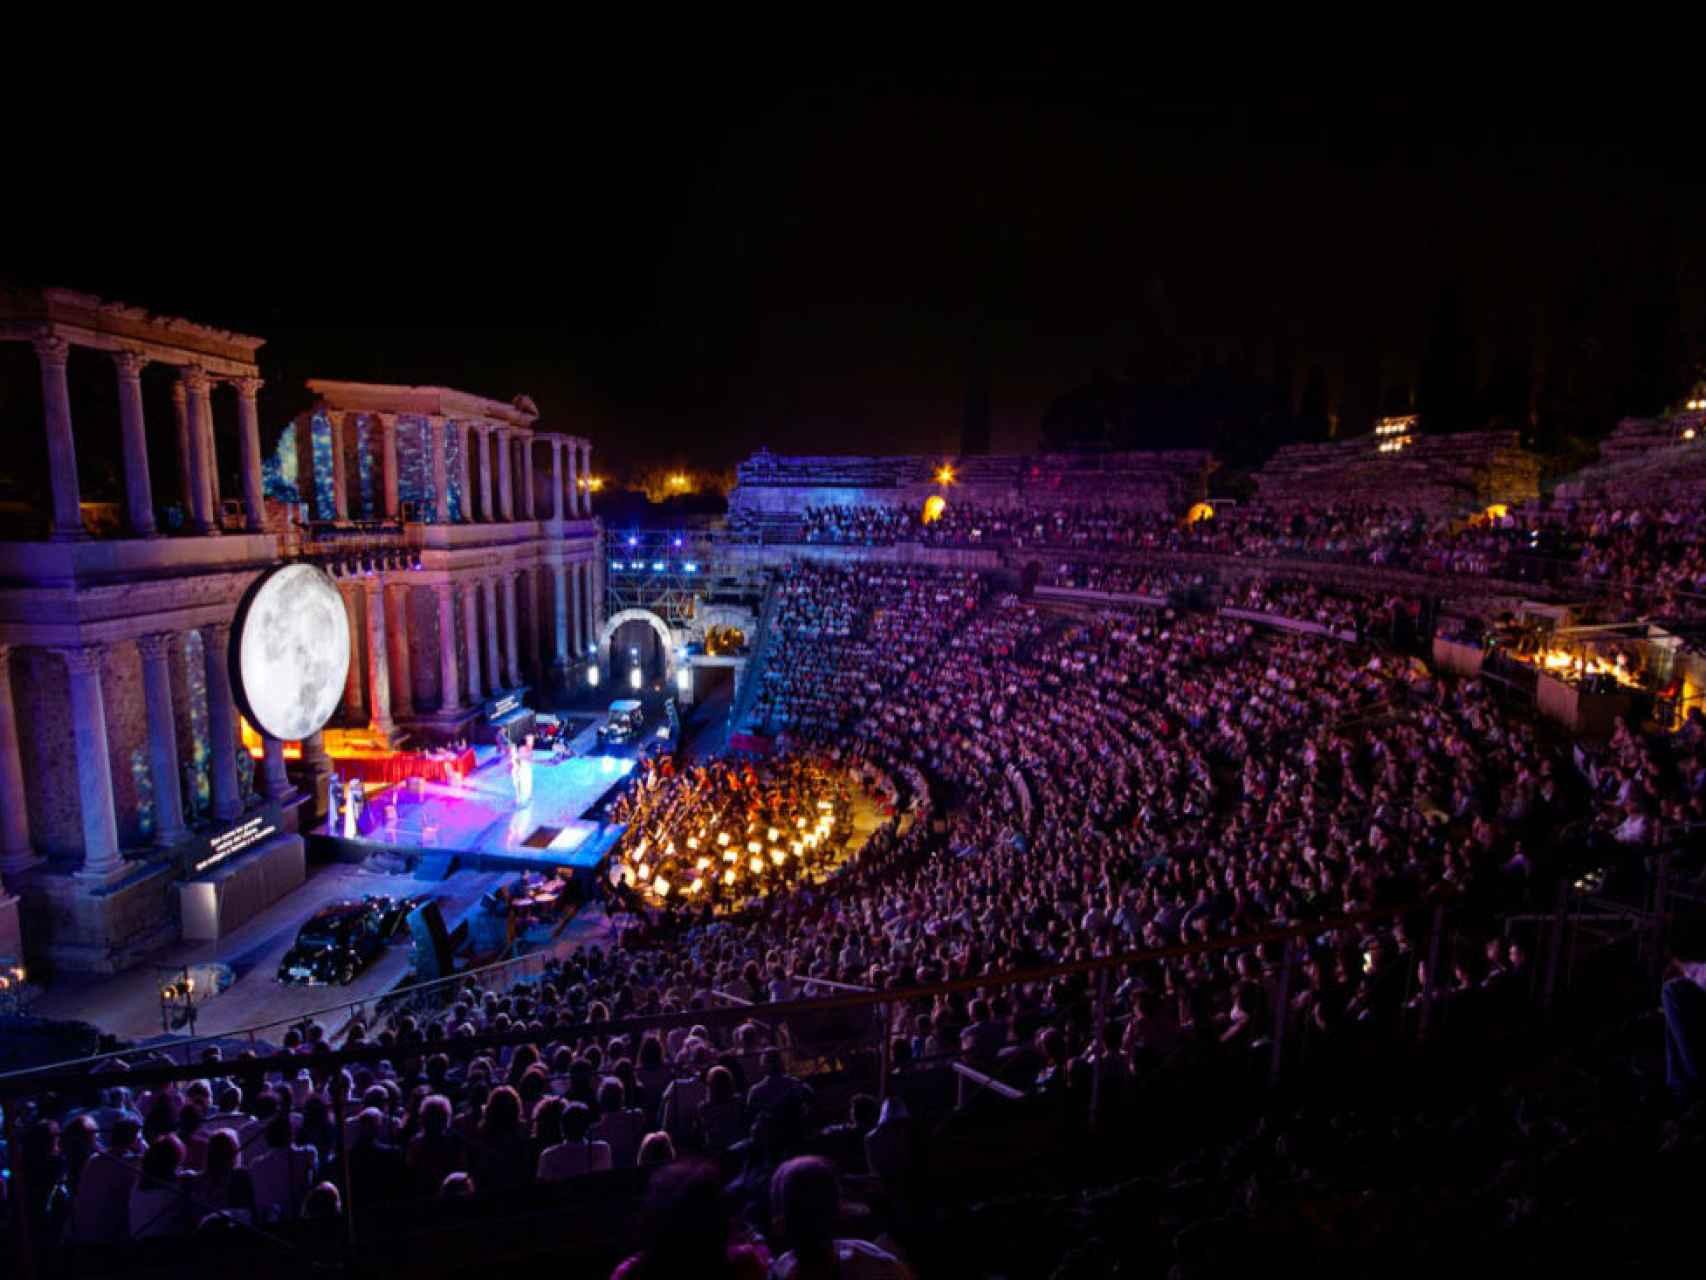 Festival de teatro clásico de Mérida.